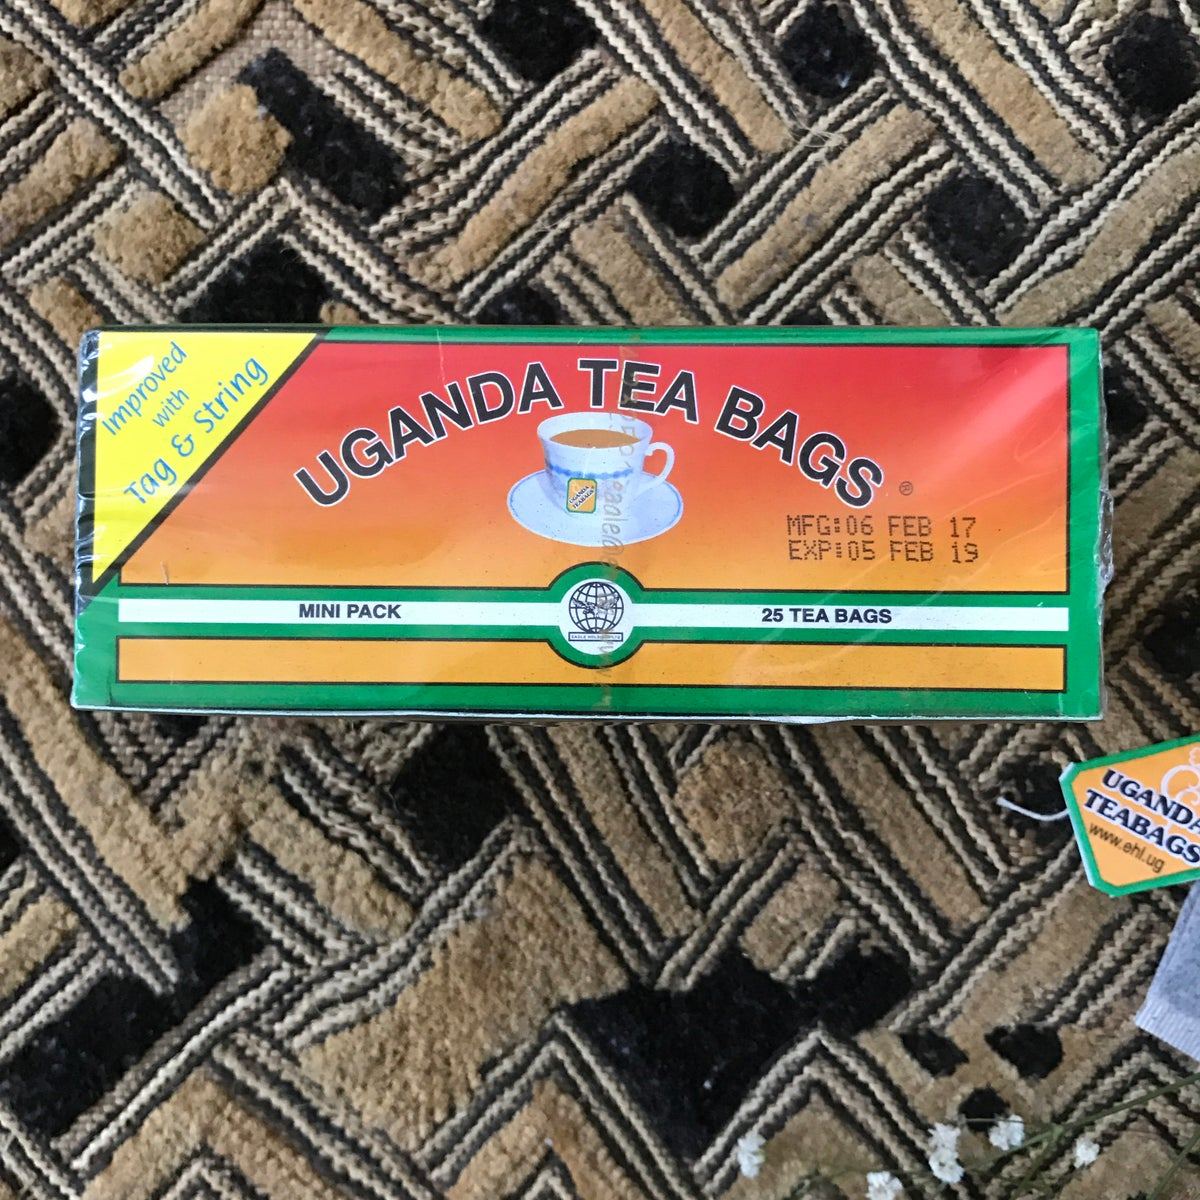 Image of Uganda Tea Bags